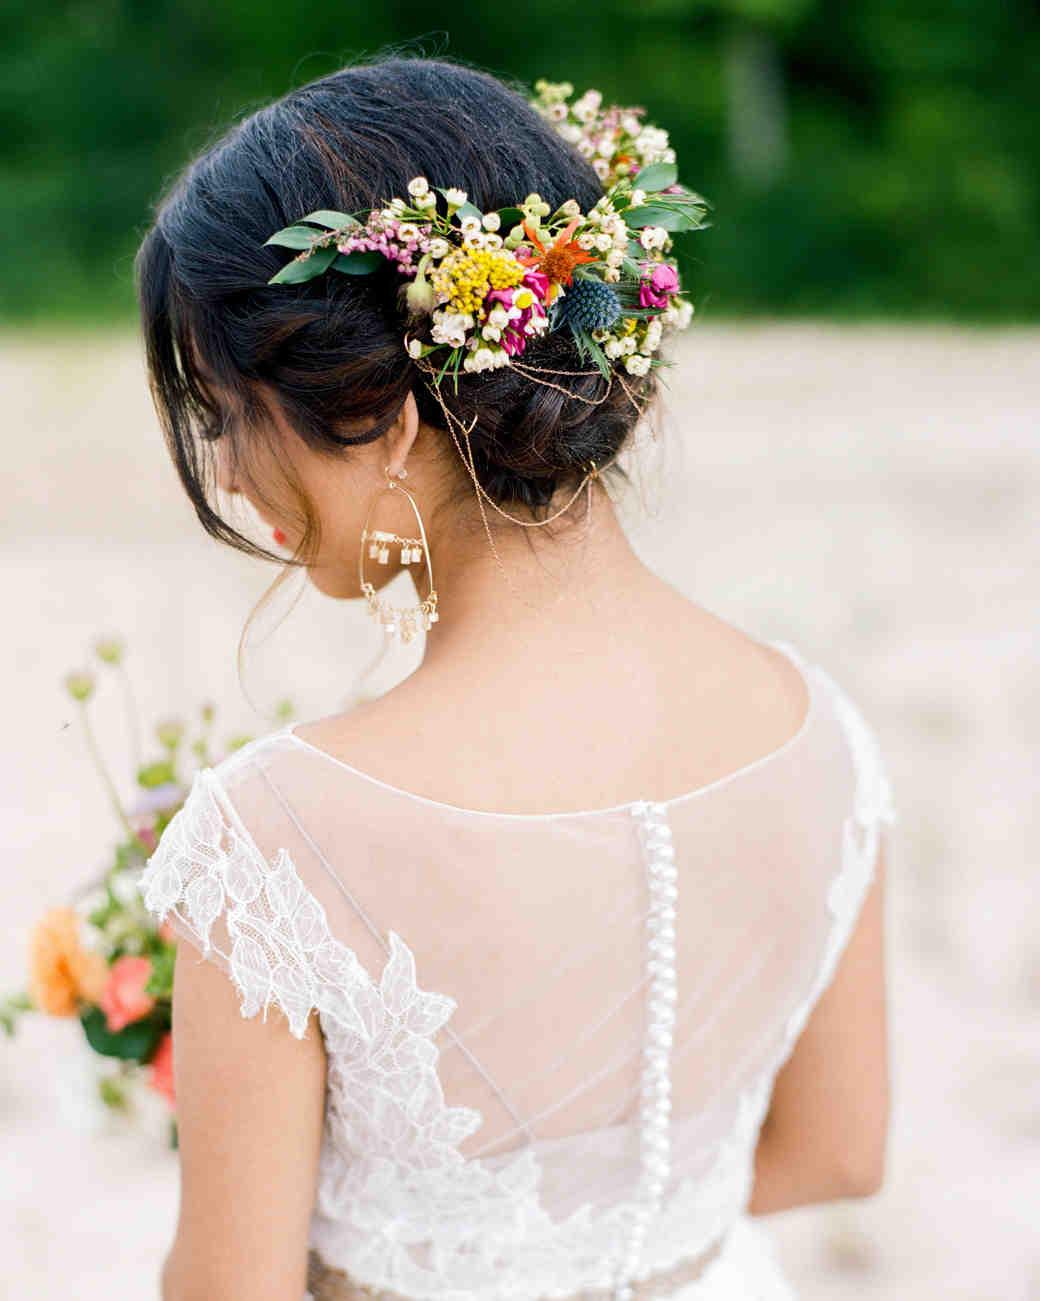 13 Braided Wedding Hairstyles We Love  Martha Stewart Weddings